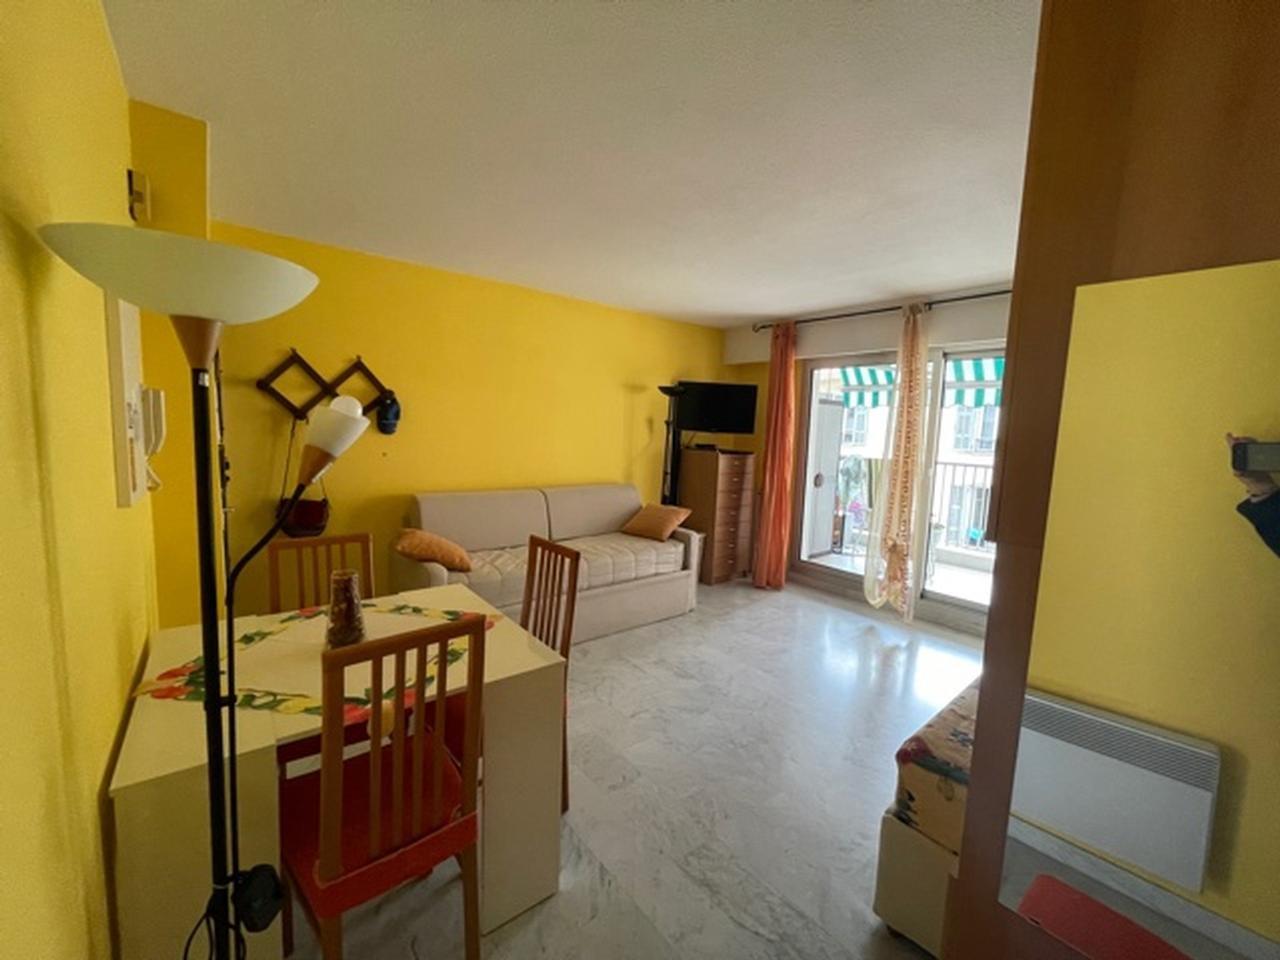 Appartement  2 Locali 38.33m2  In vendita   270000 €